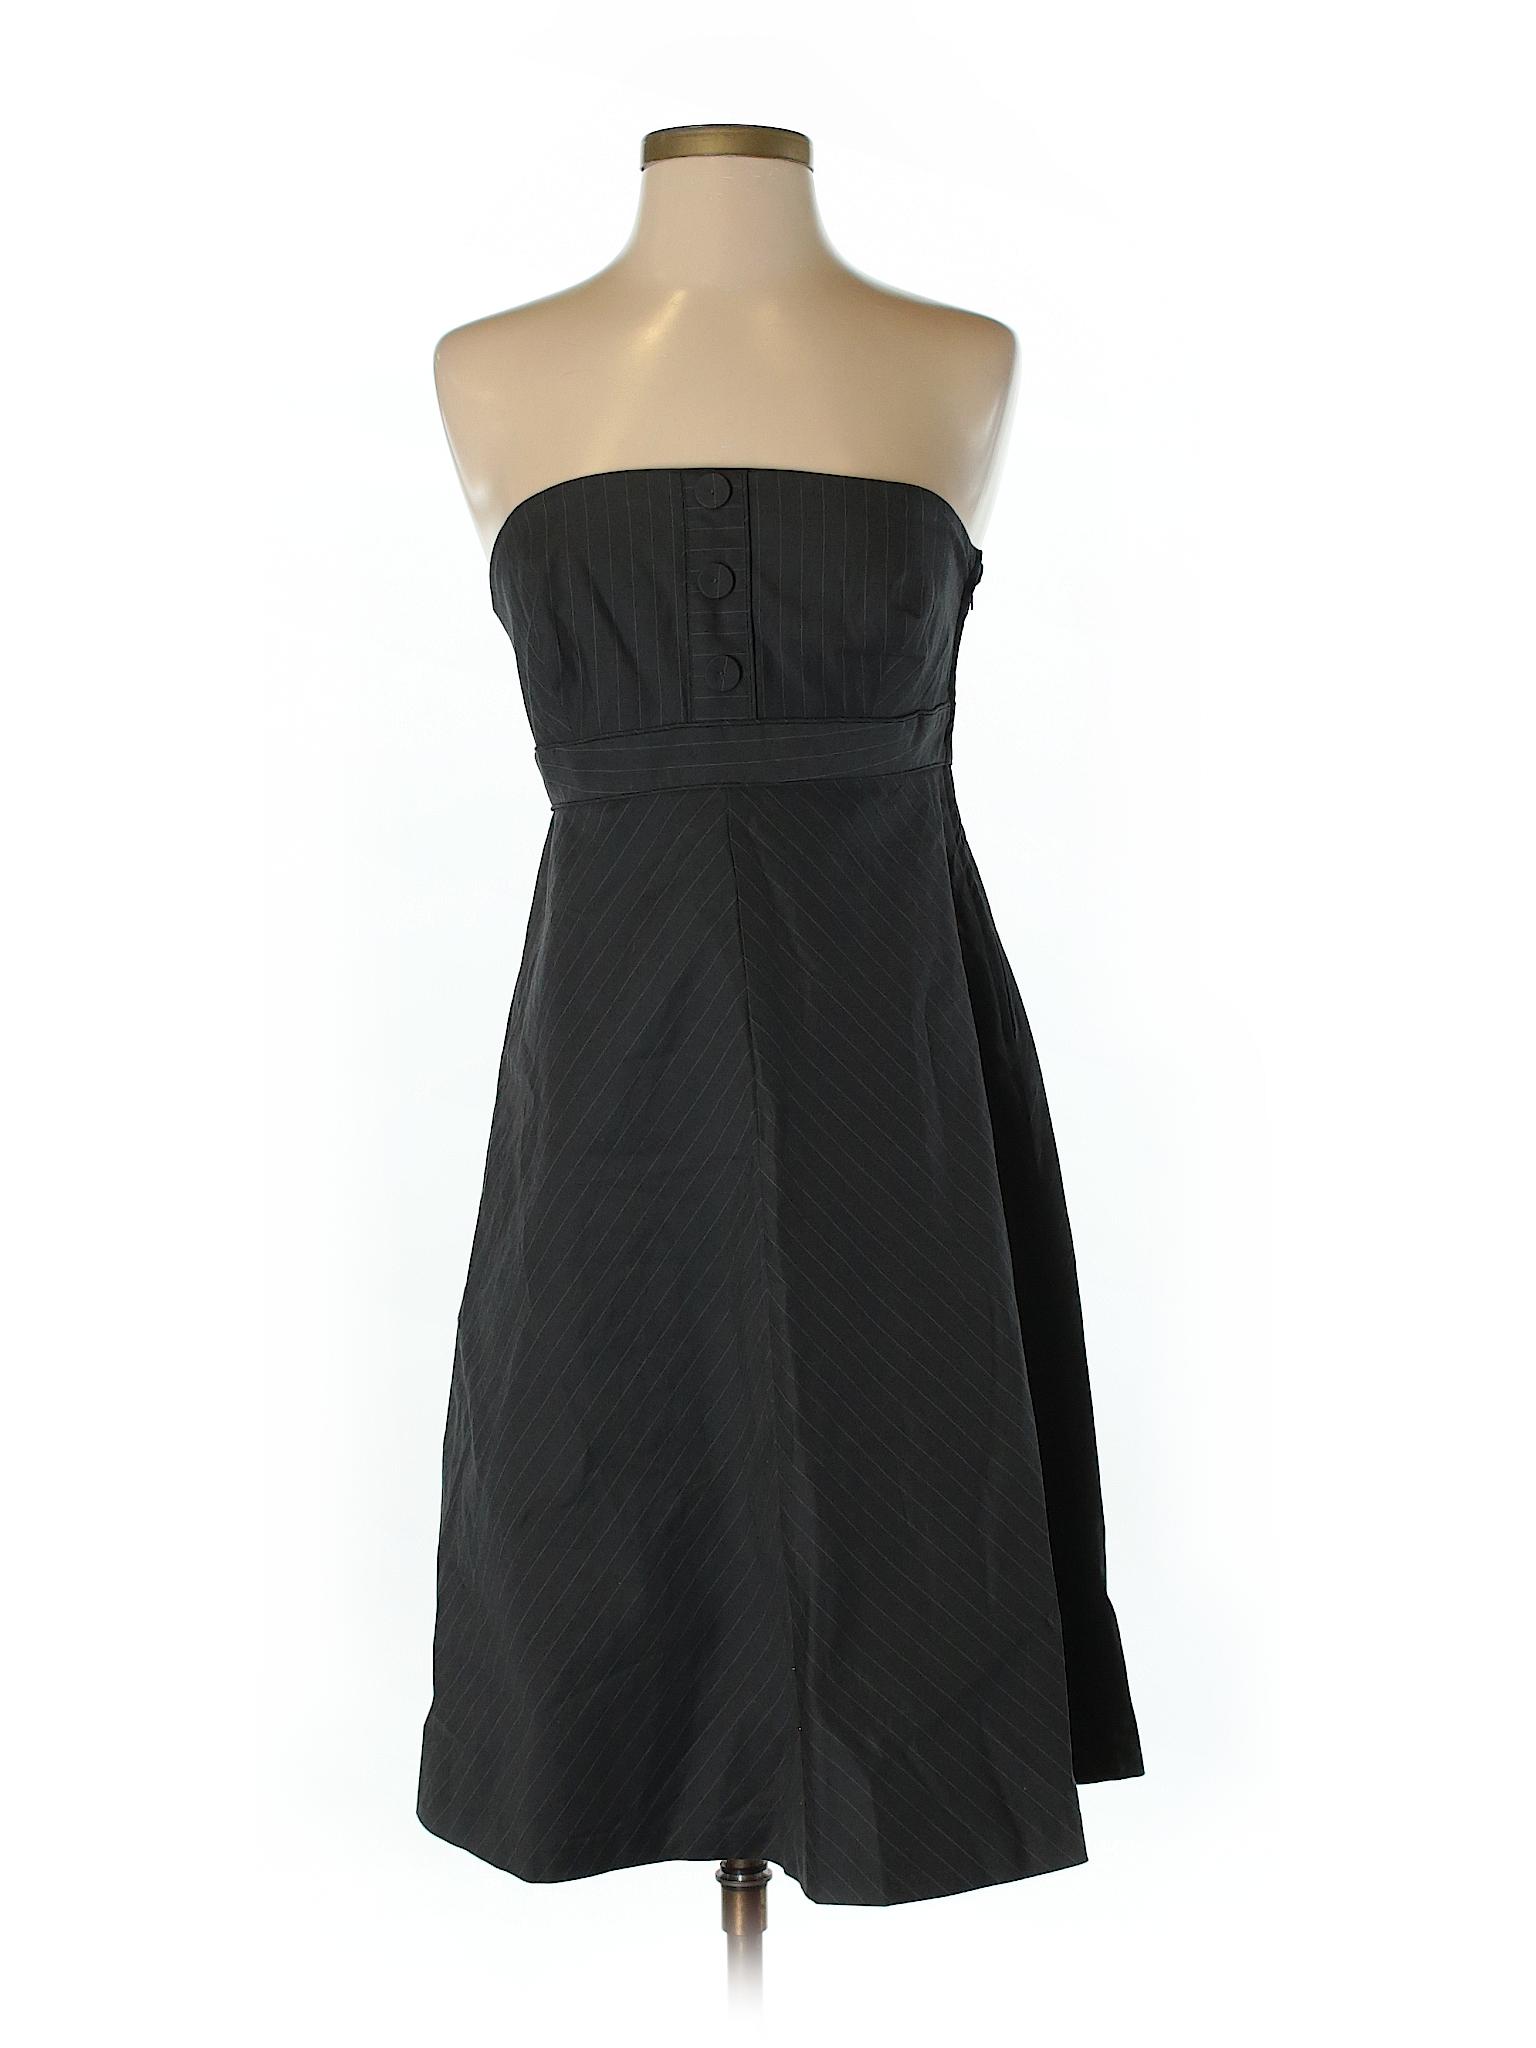 Gap Casual Casual Dress Dress Gap Selling Selling Selling RwEYEXg